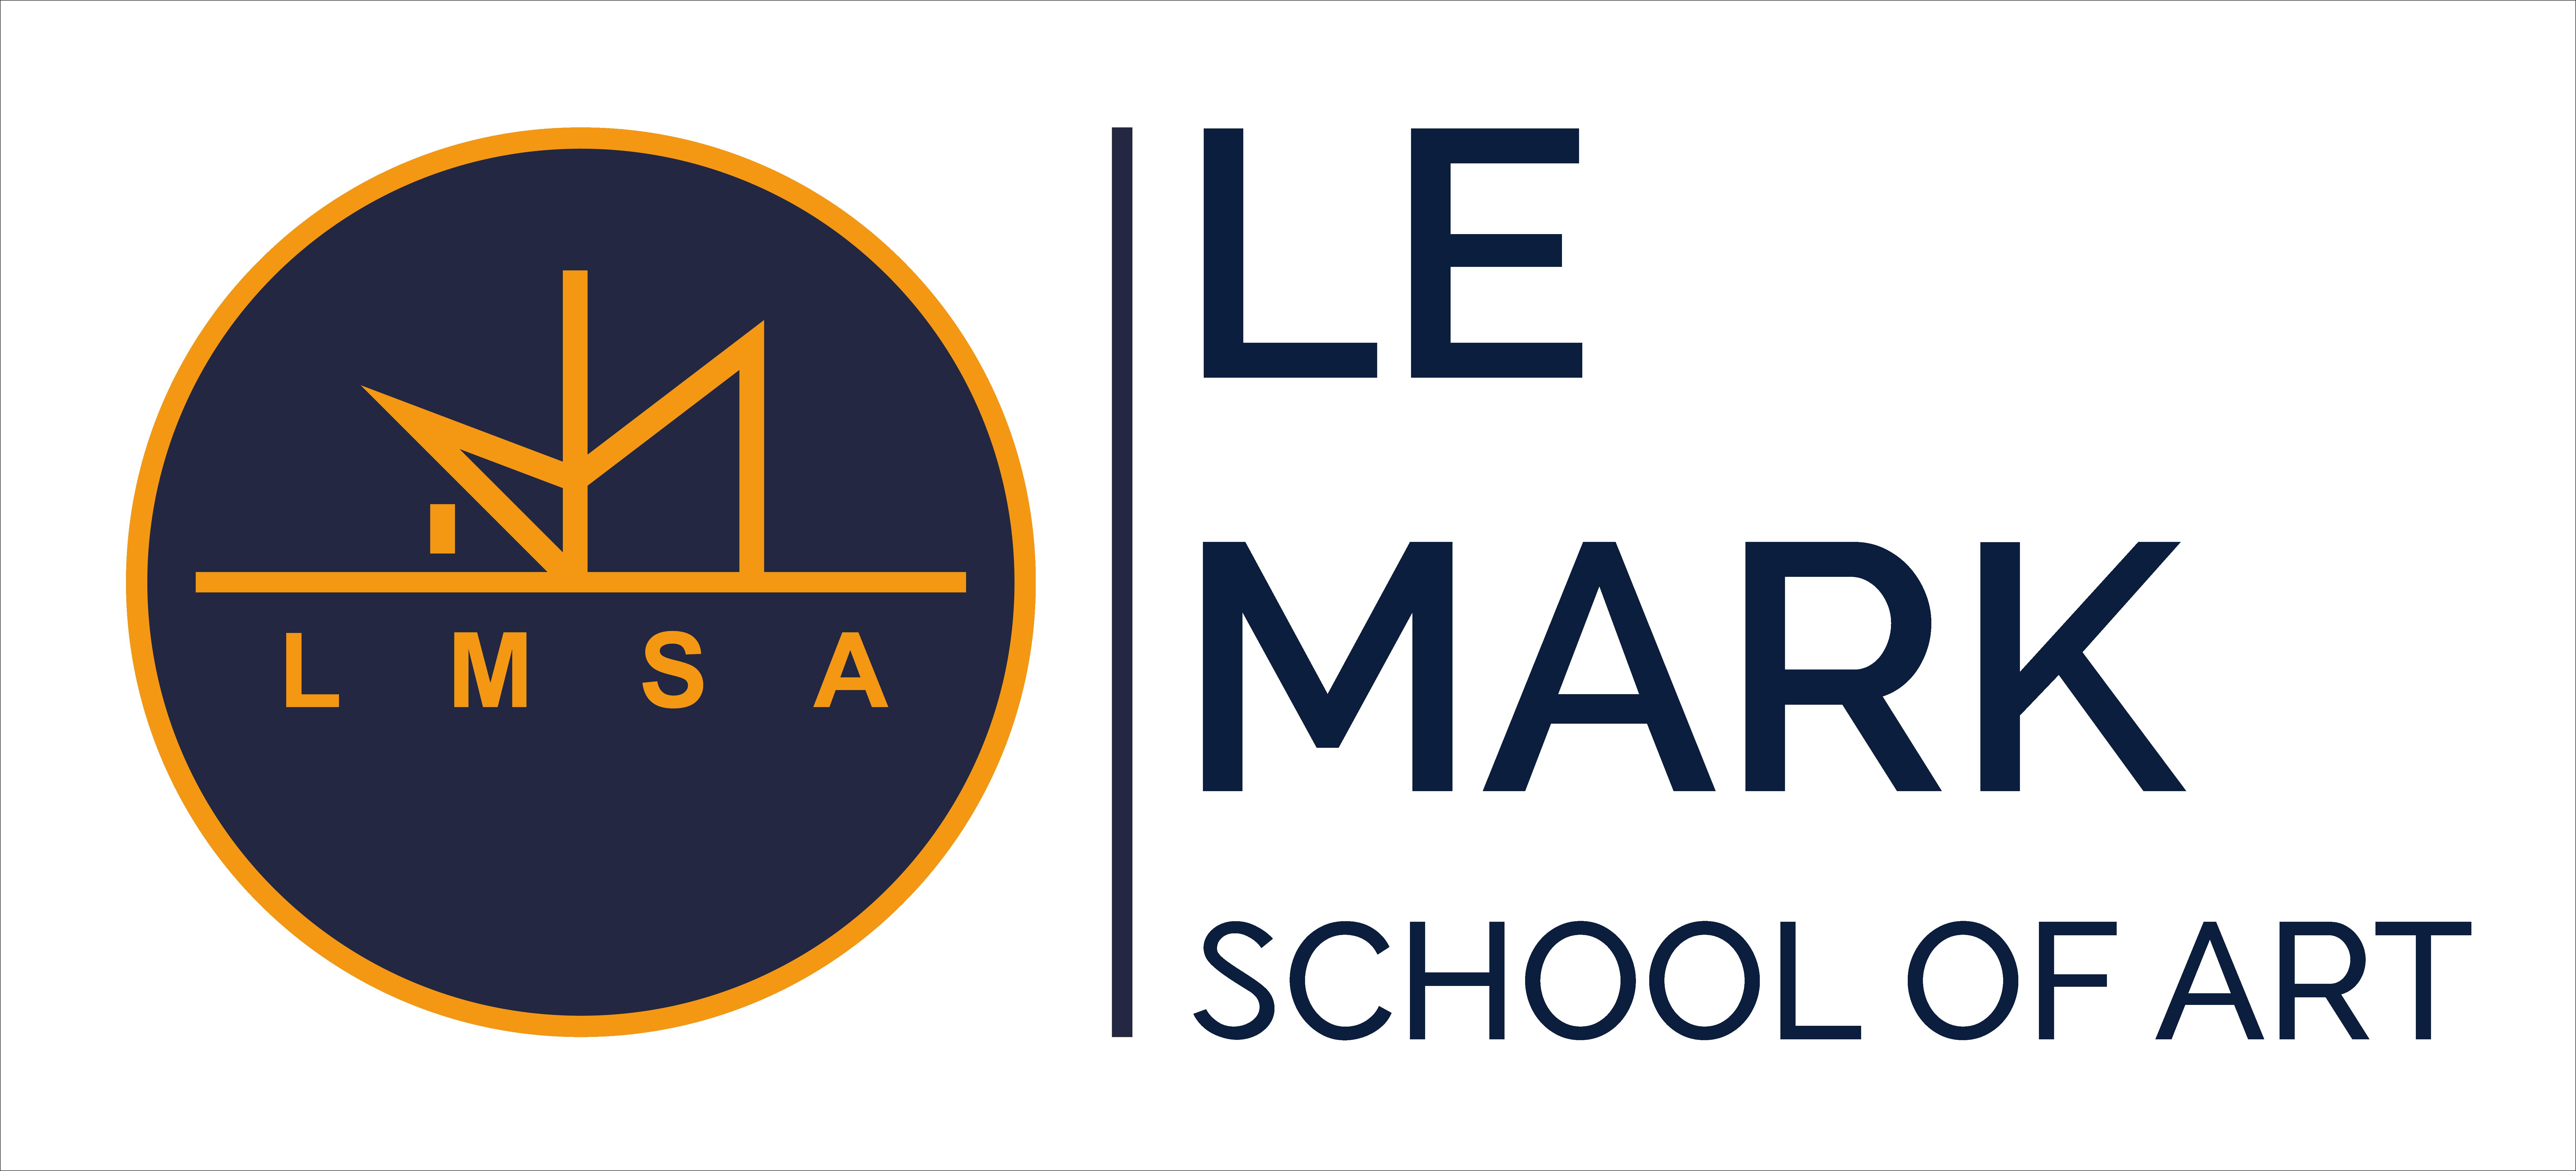 Le Mark School of Art Logo